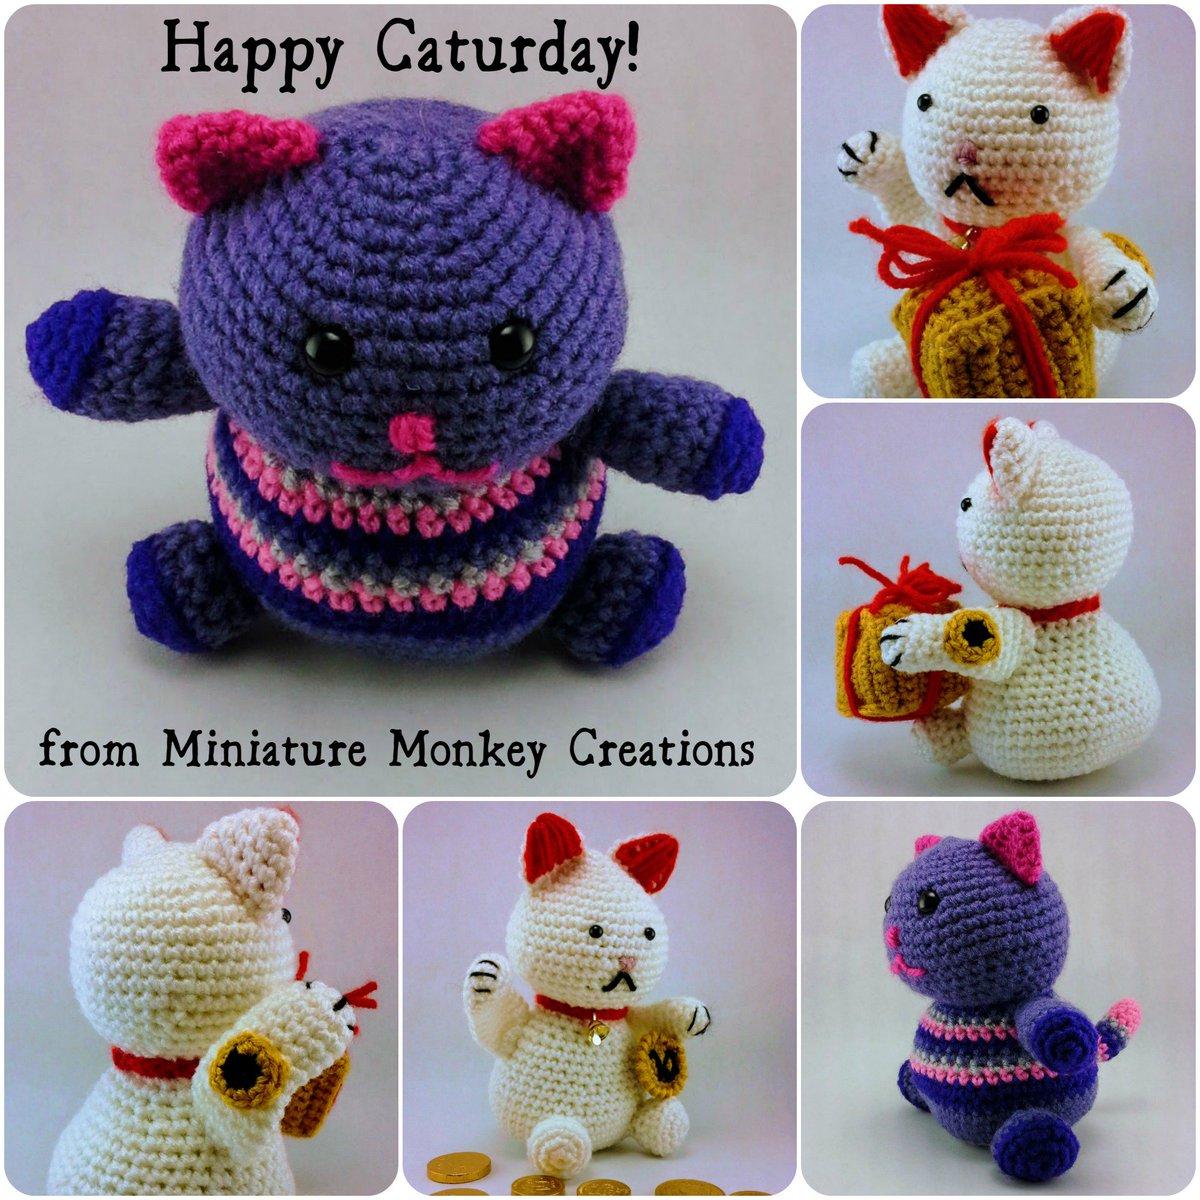 Little Fat #Kitty and #Lucky #Cat wish you a Happy #Caturday!  https:// goo.gl/Rl9RSg  &nbsp;   #handmade #vegan #custom #Zibbet<br>http://pic.twitter.com/uHfZAv25d2